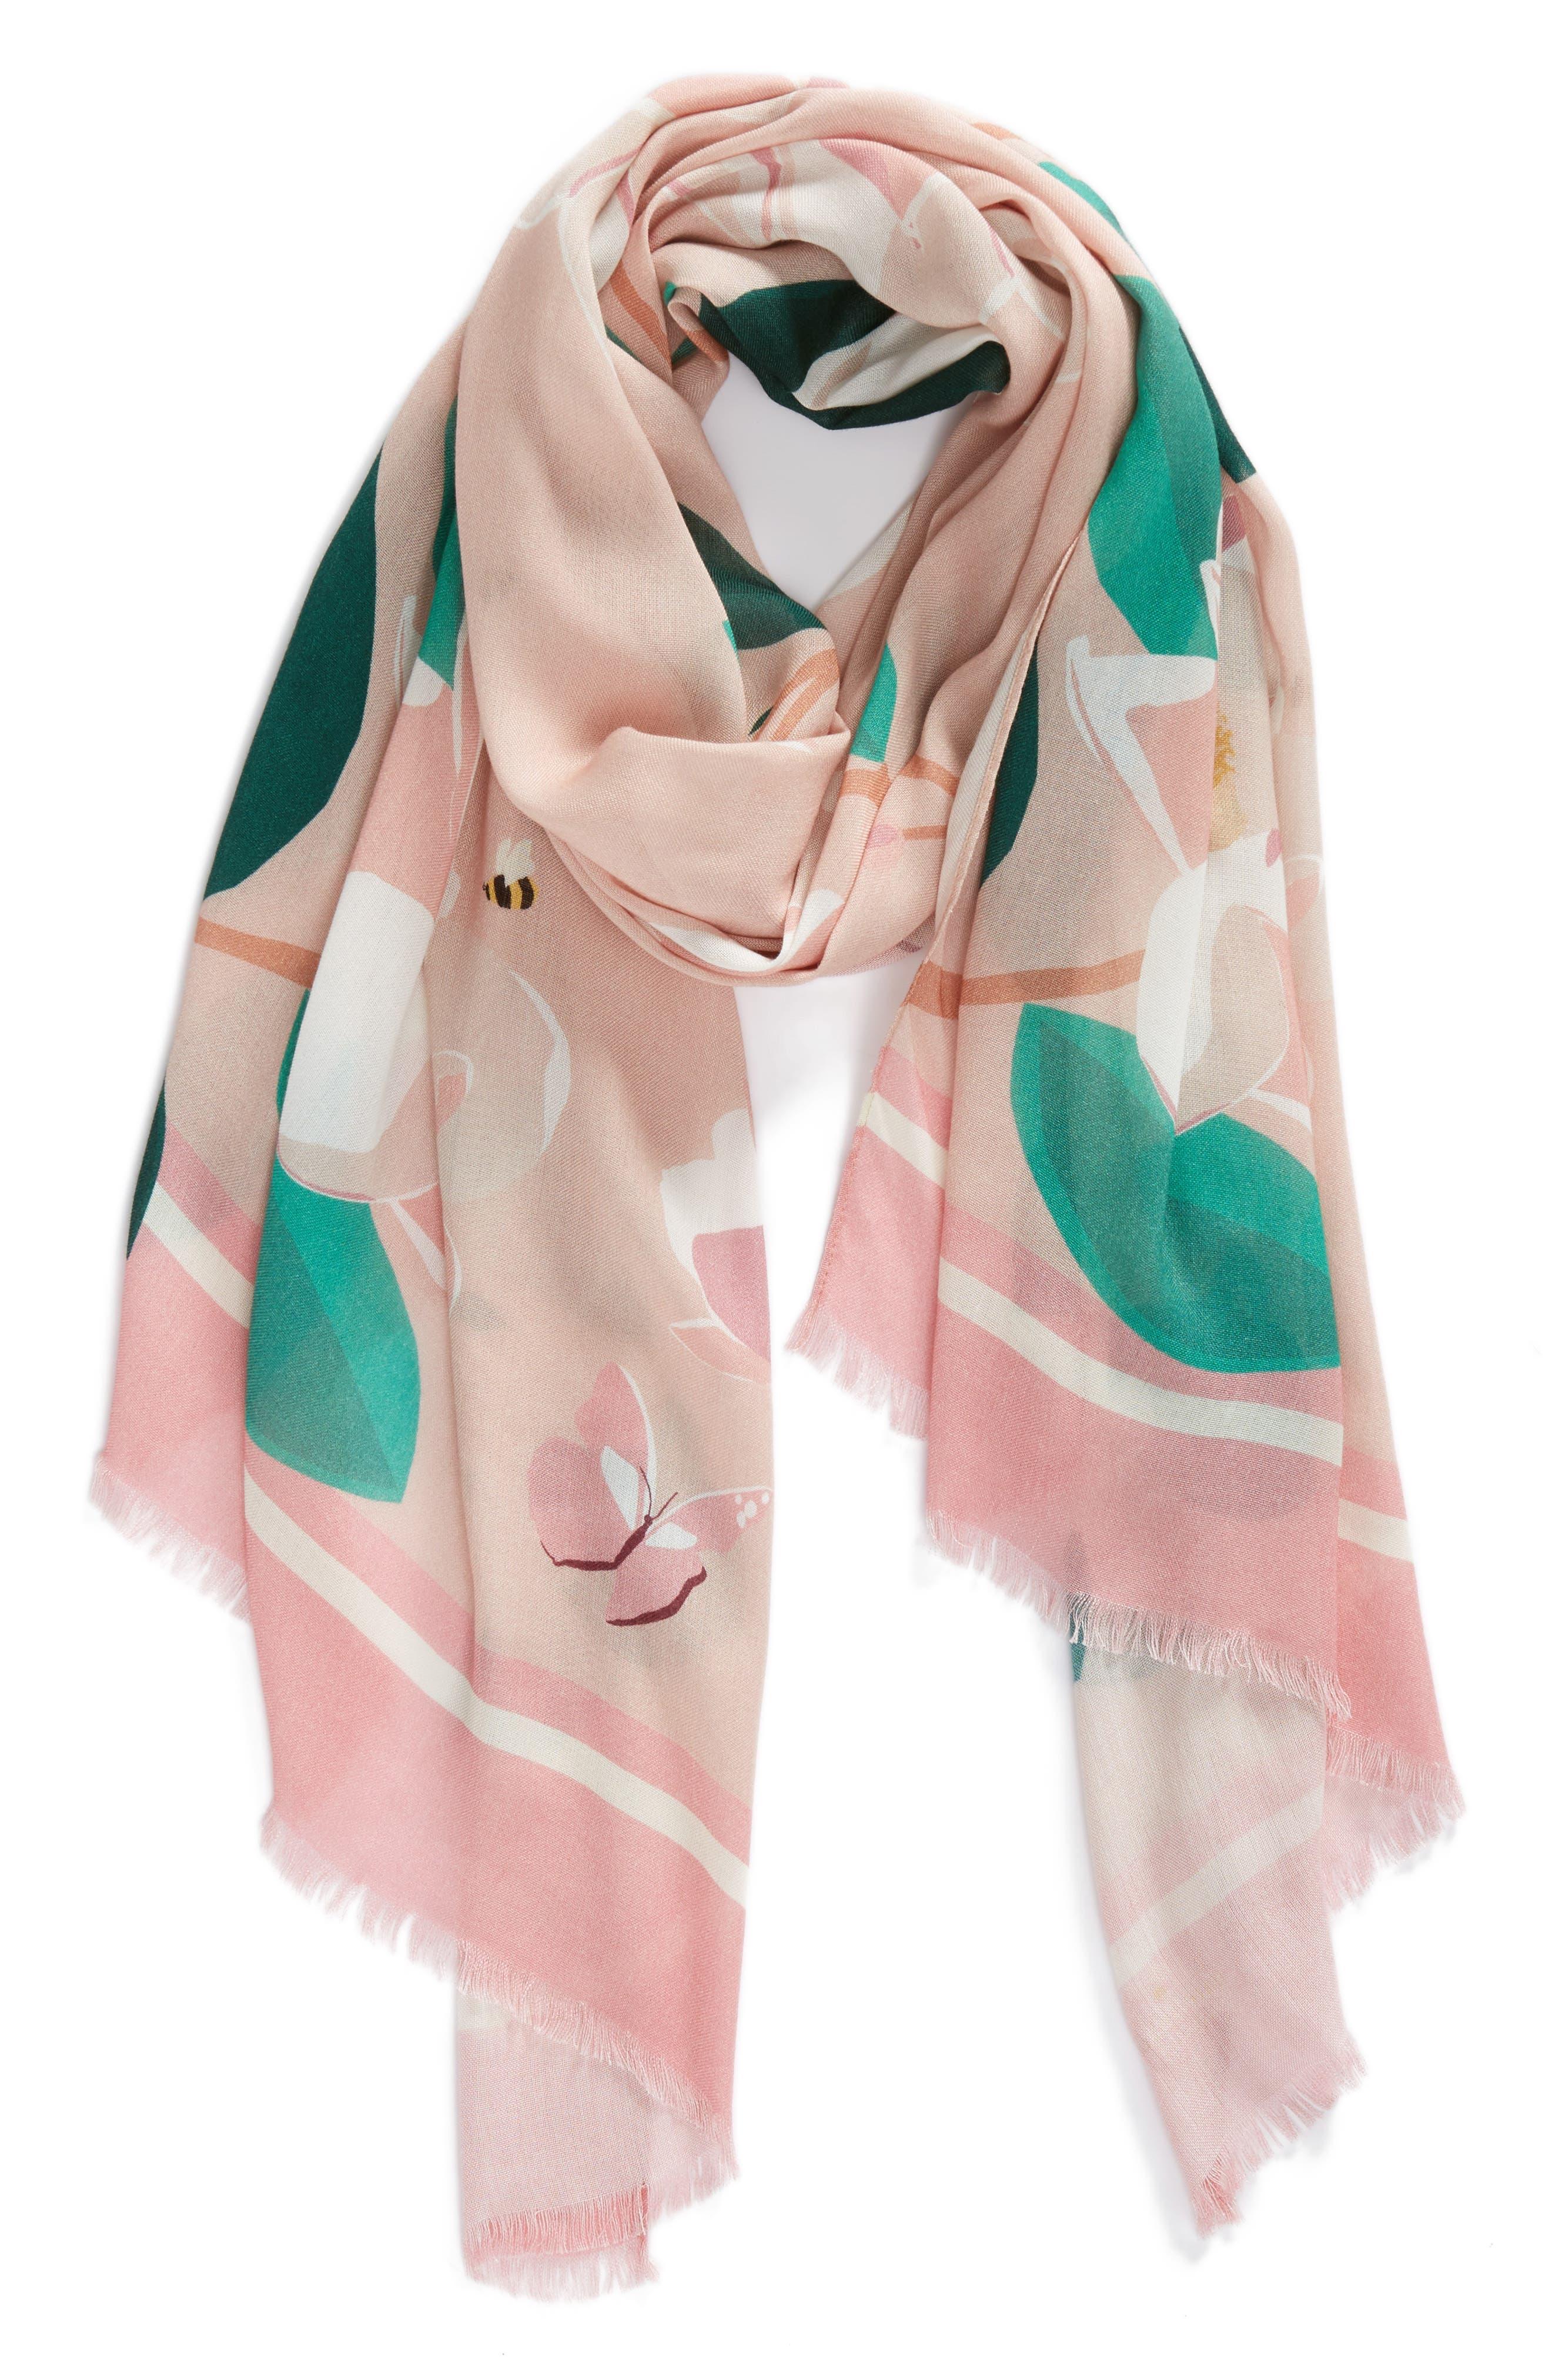 magnolia scarf,                             Alternate thumbnail 2, color,                             698